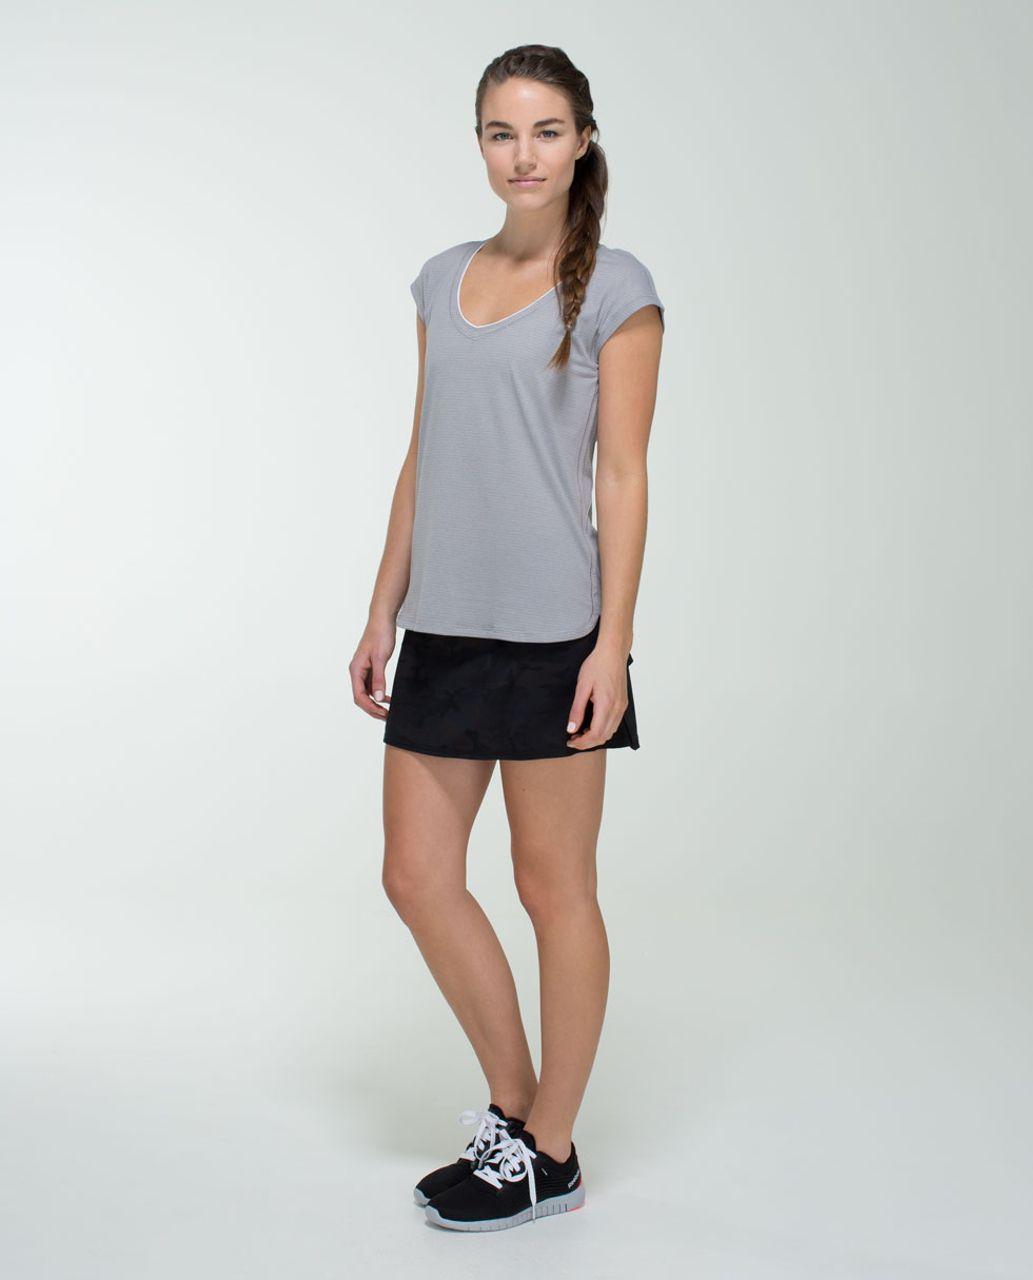 Lululemon Run:  Pace Setter Skirt (Regular) *4-way Stretch - Savasana Camo 20cm New Black / Black